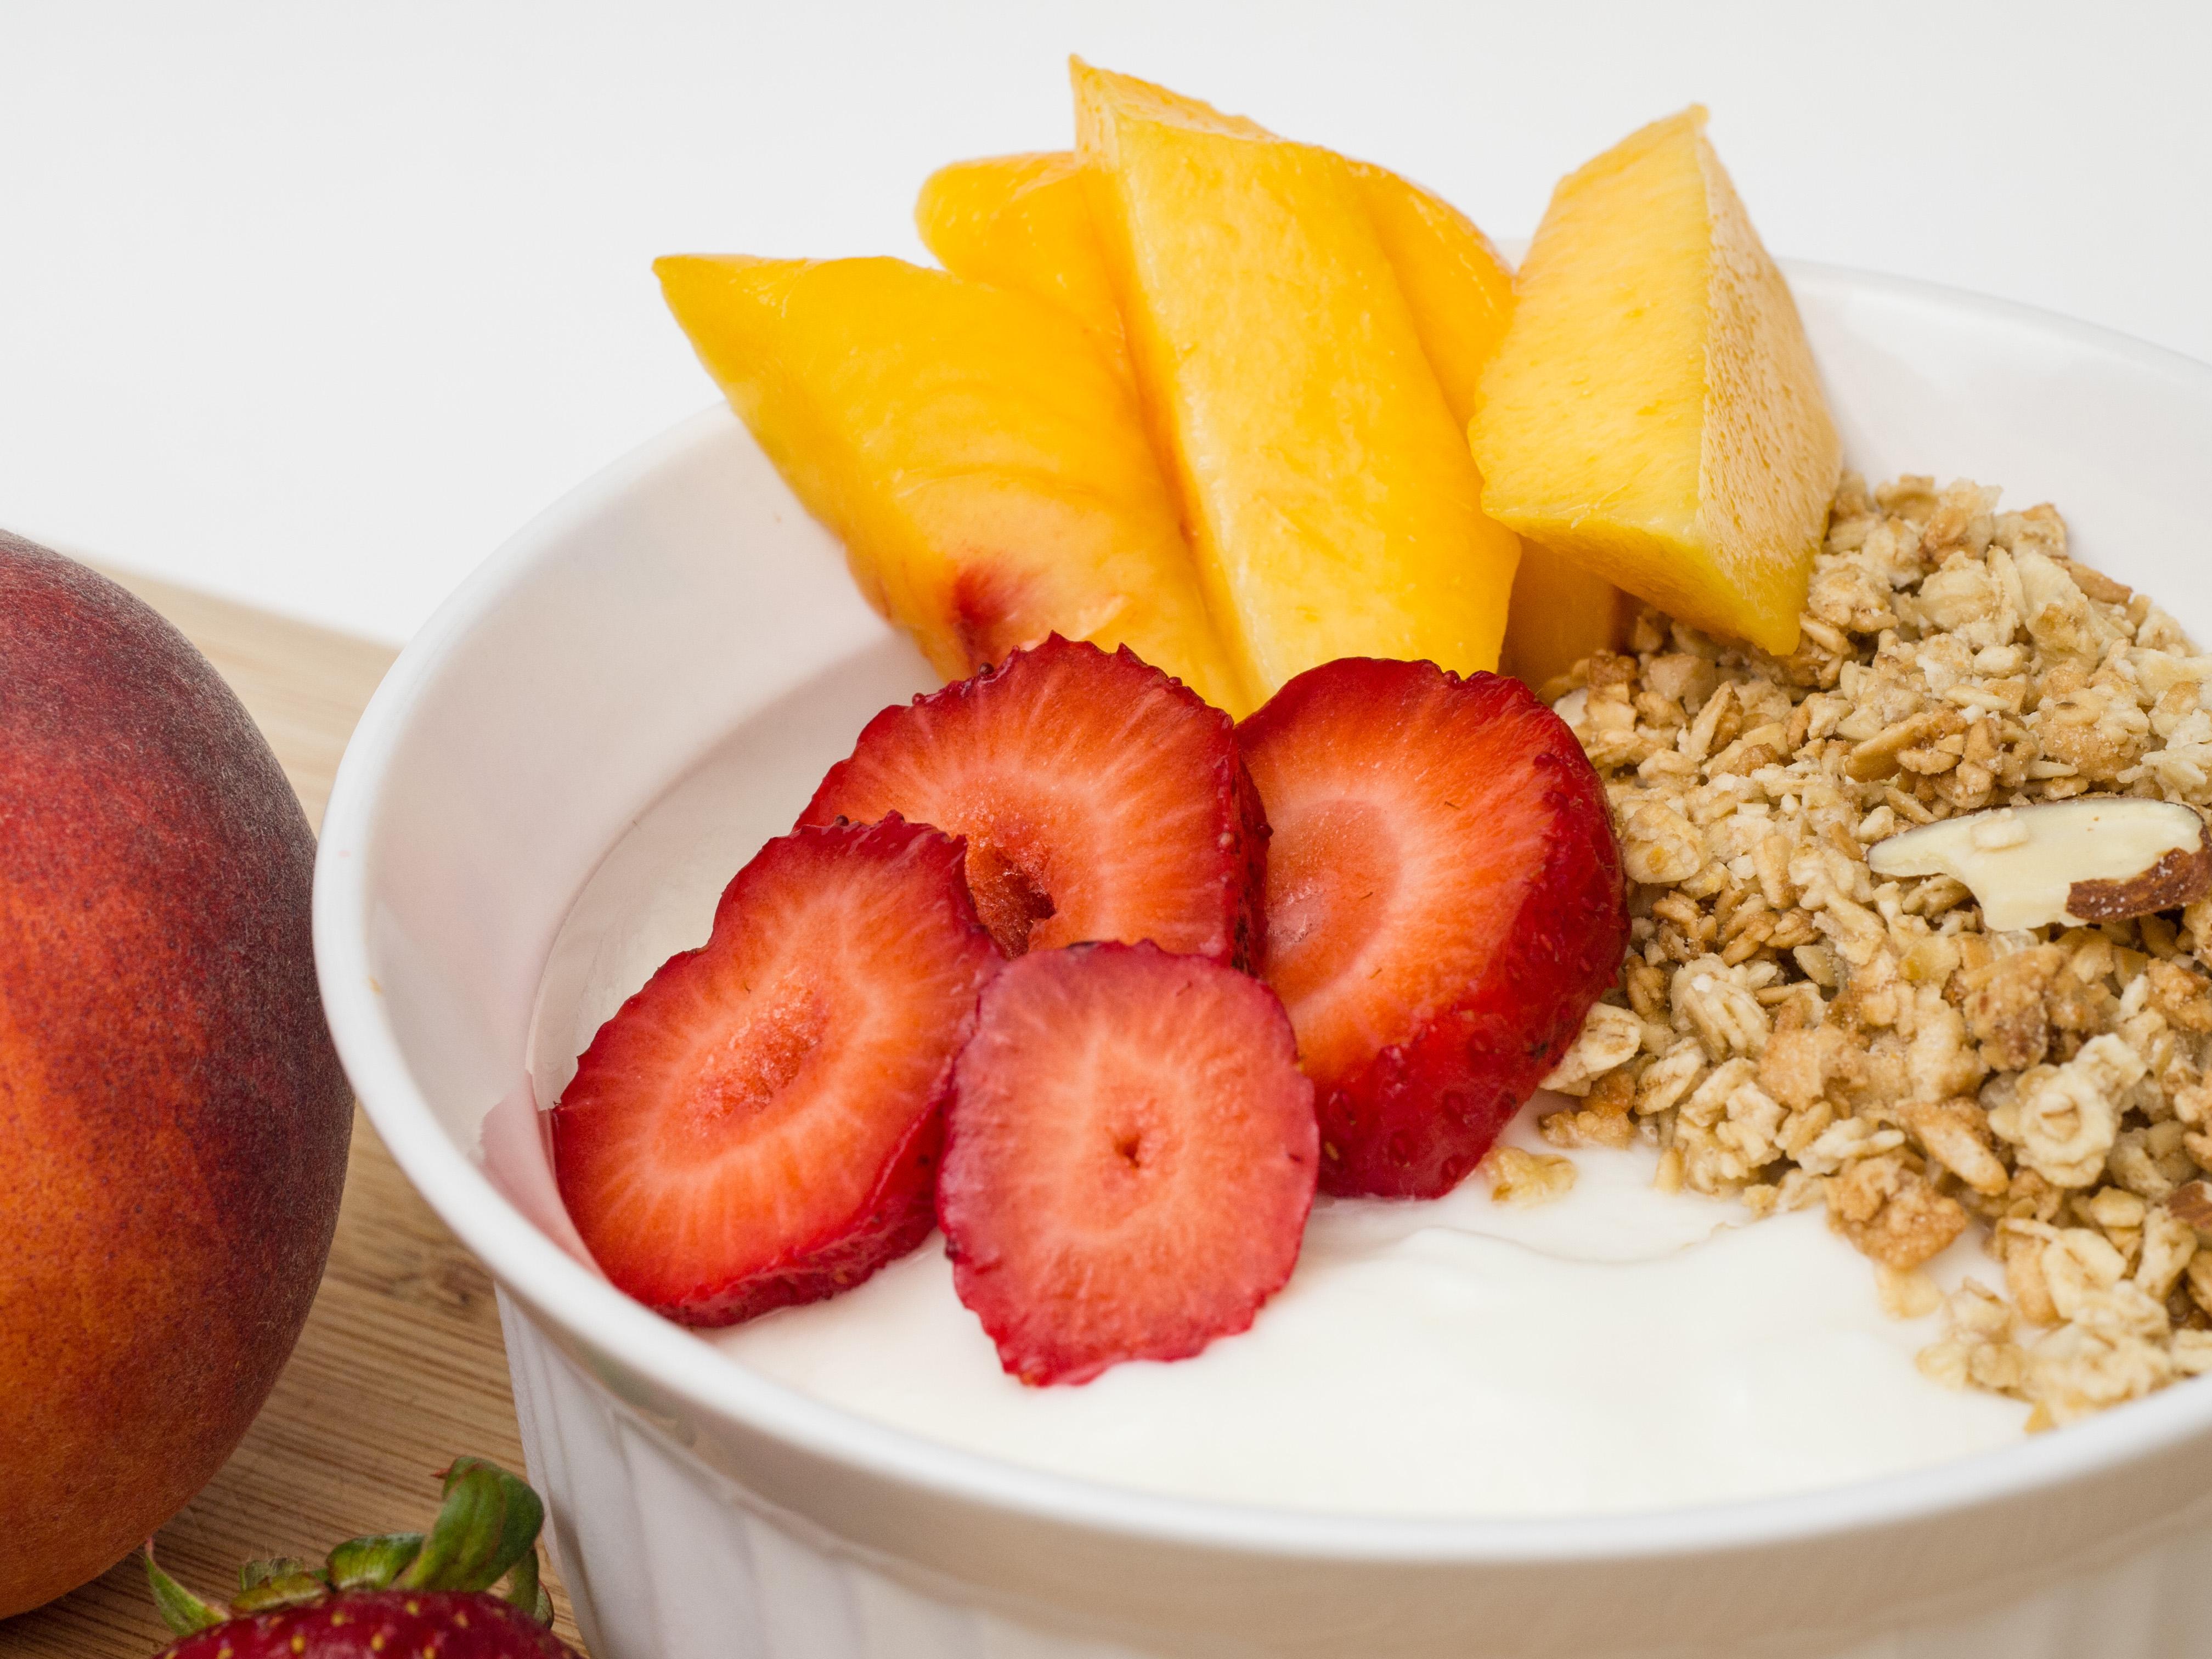 Yogurt with Fruit & Granola